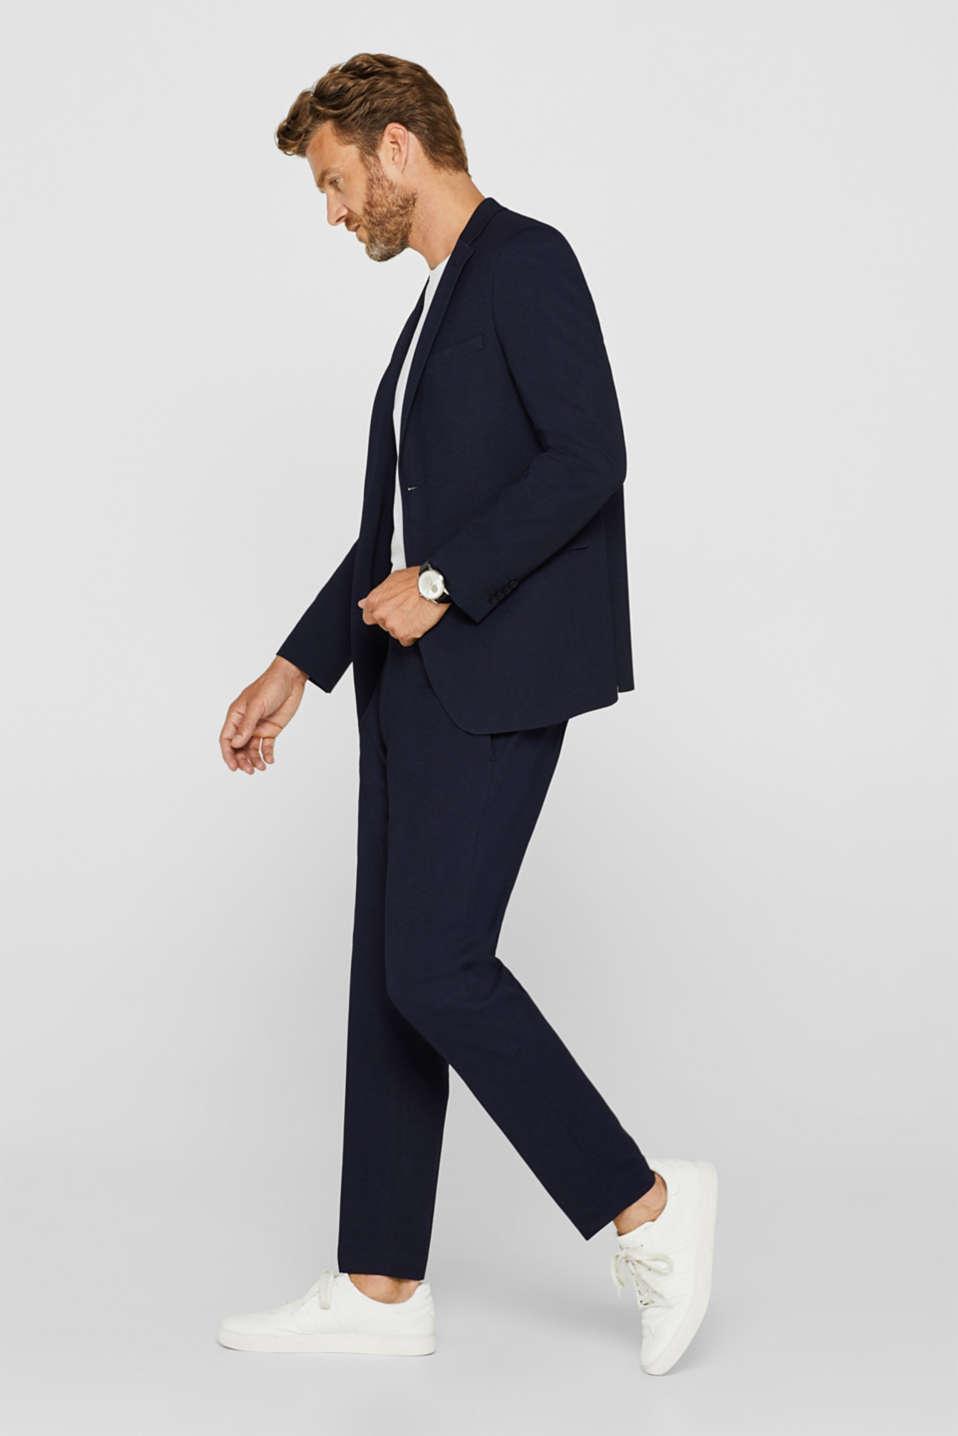 COMFORT SUIT mix + match: Textured jacket, NAVY, detail image number 1